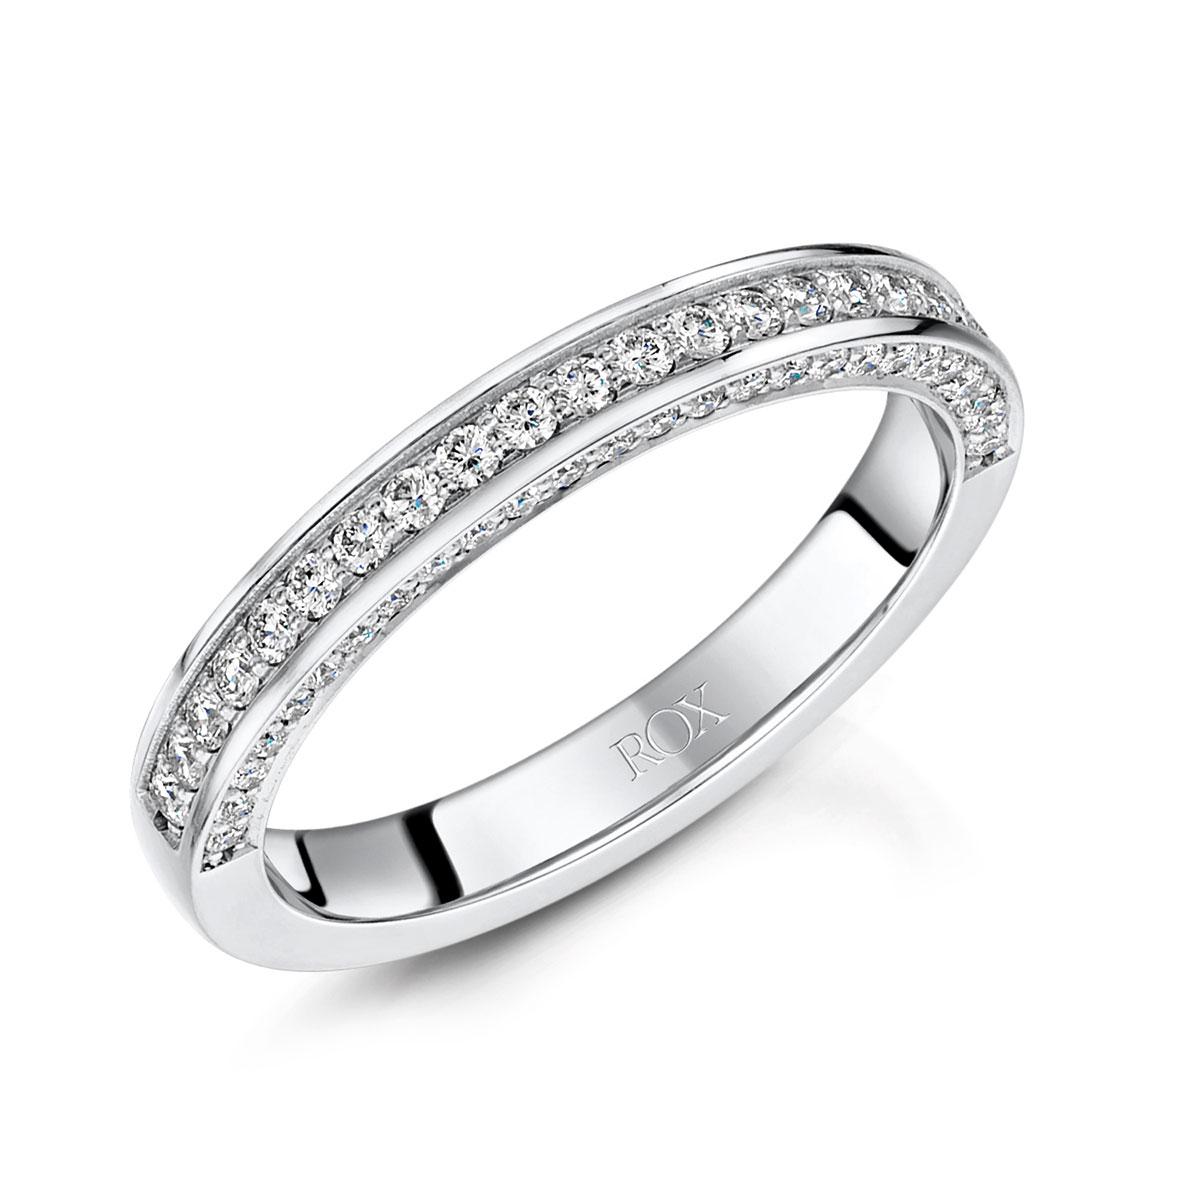 ROX Adore Diamond Wedding Ring 0.37ct